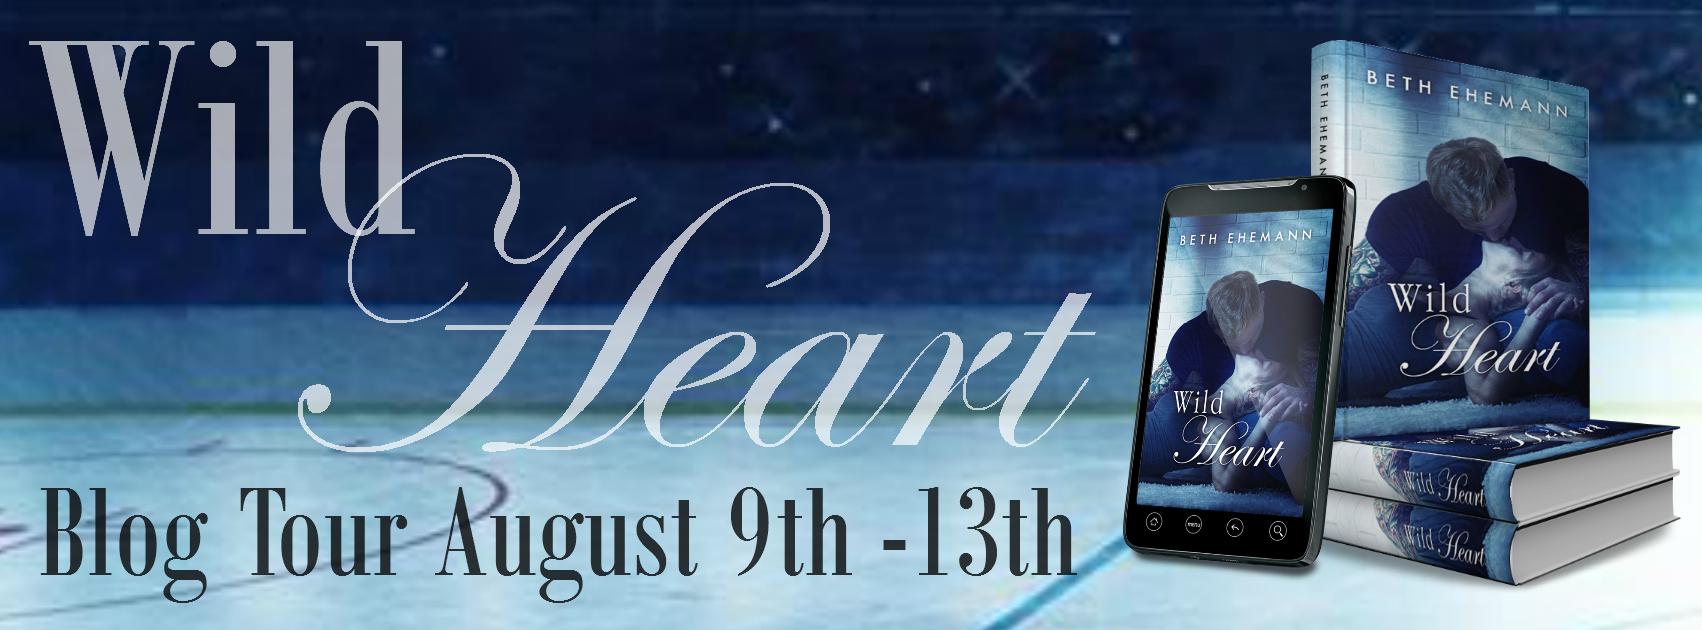 Wild Heart Tour Banner